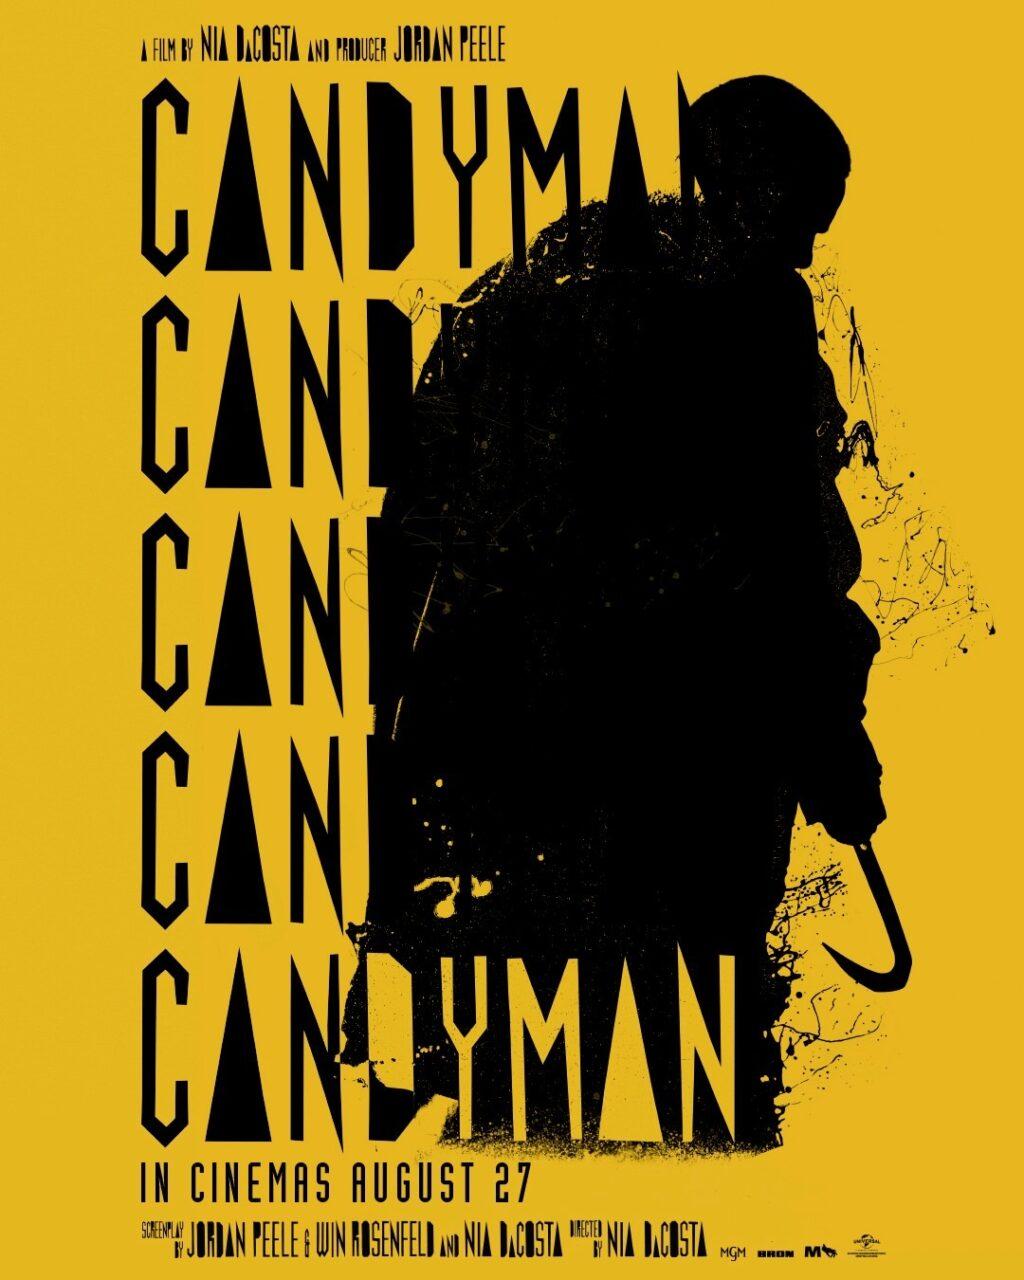 Candyman 1024x1280 - How Co-Star Kyle Kaminsky Made His On-Screen 'Candyman' Couple Feel Real